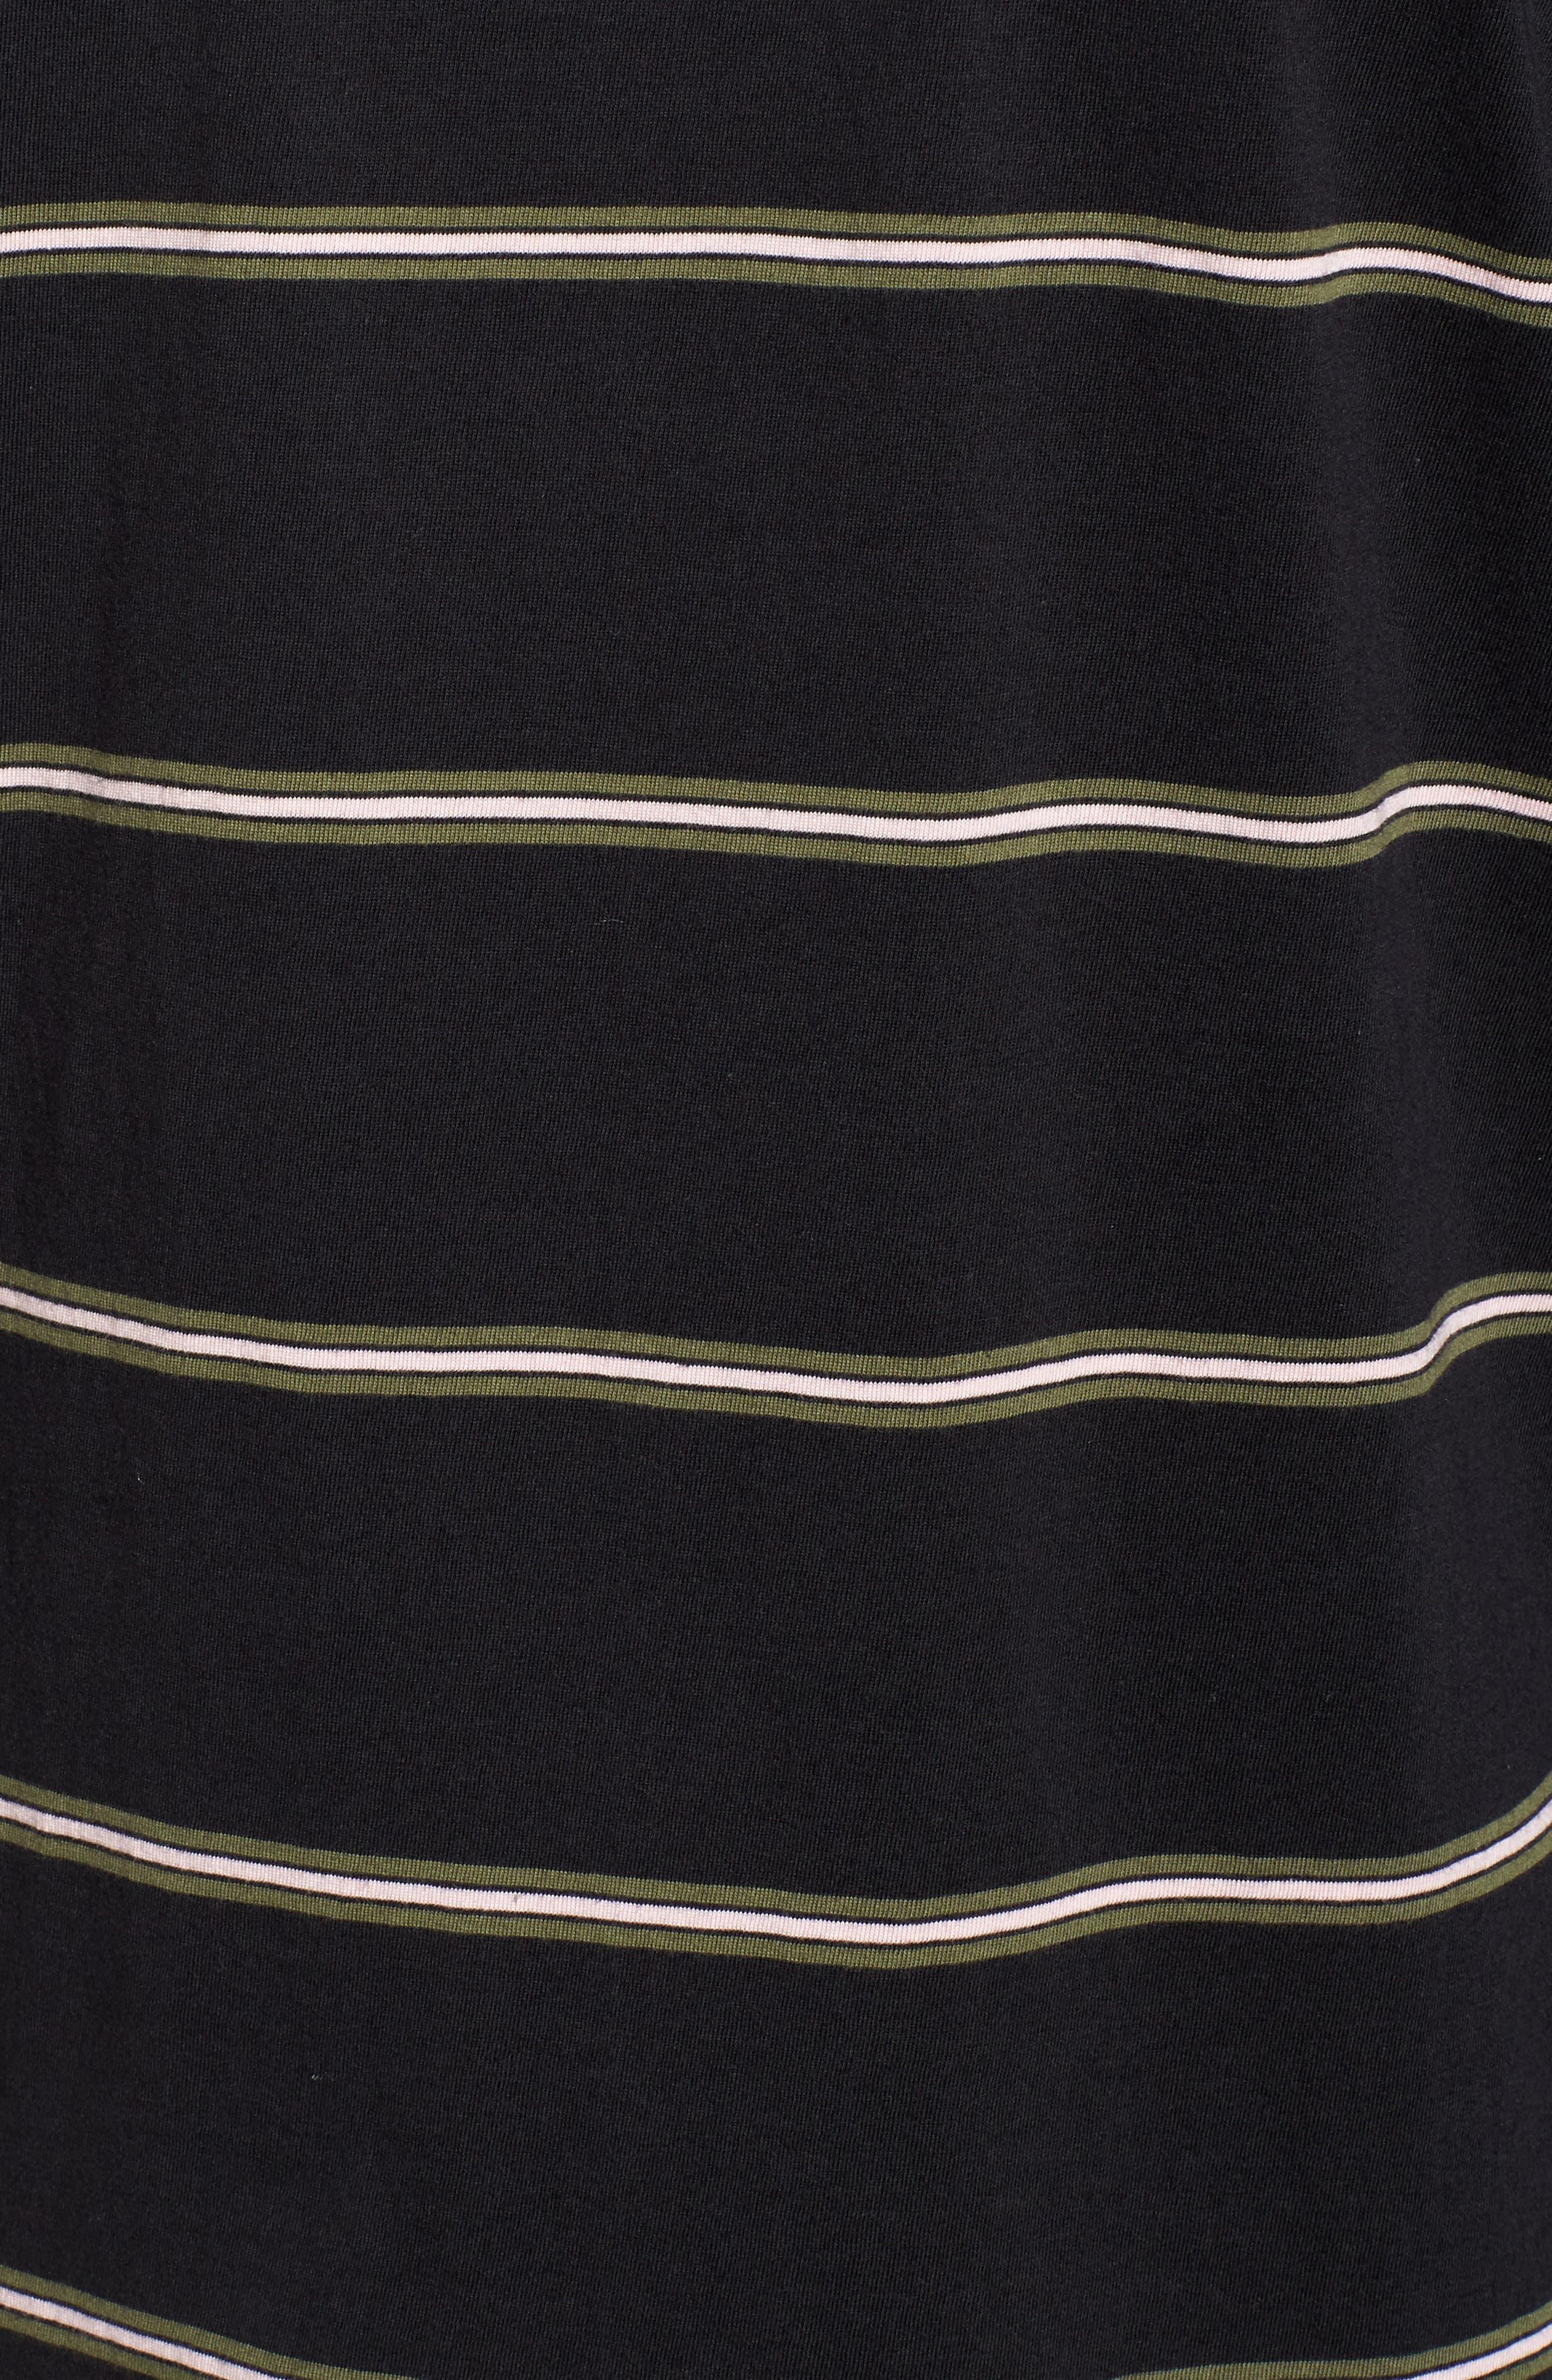 Die Cut Hooded Long Sleeve T-Shirt,                             Alternate thumbnail 5, color,                             001